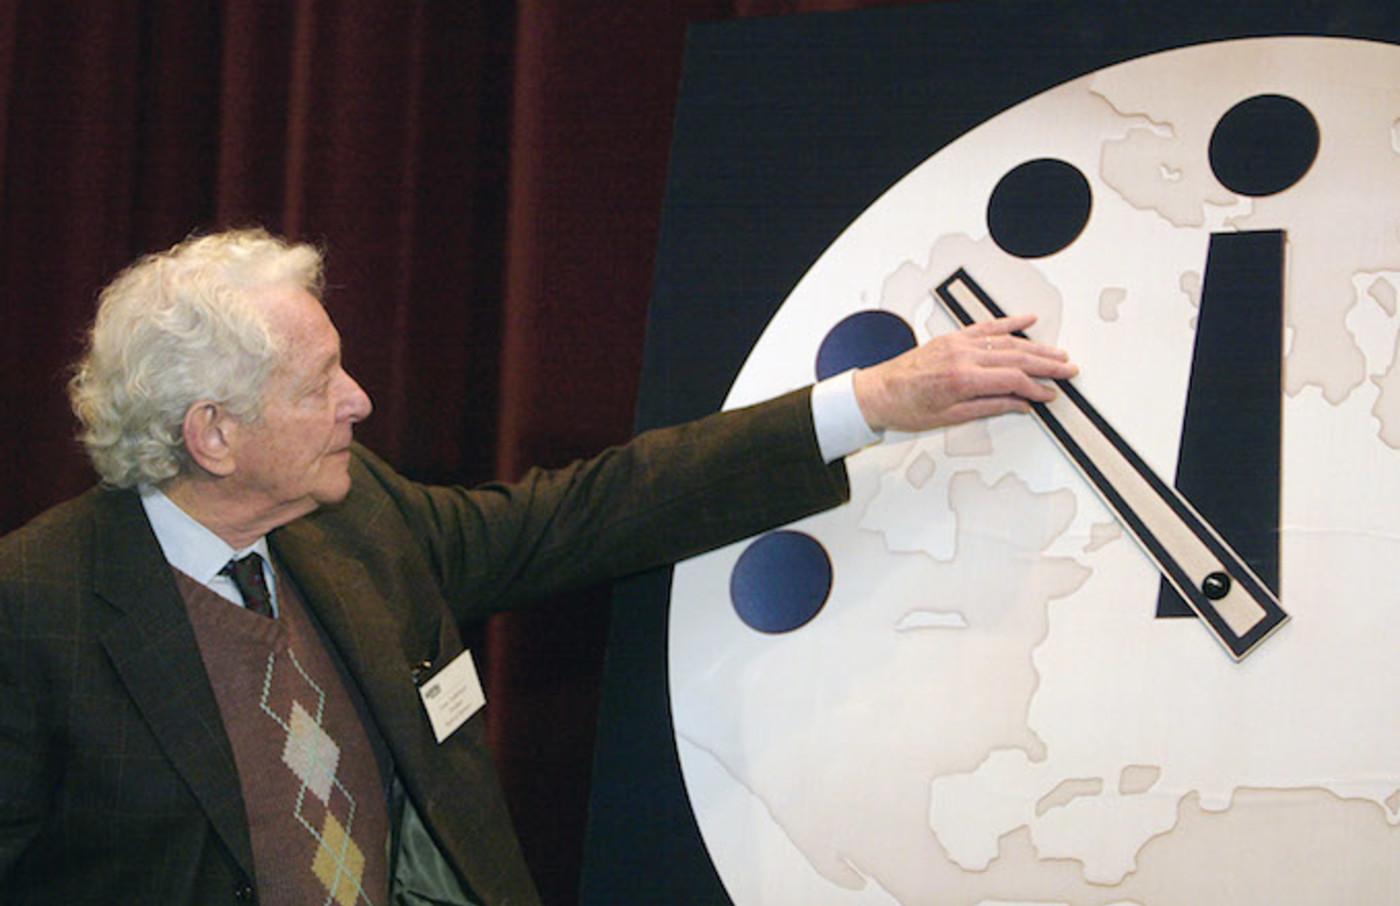 Doomsday Clock in 2002